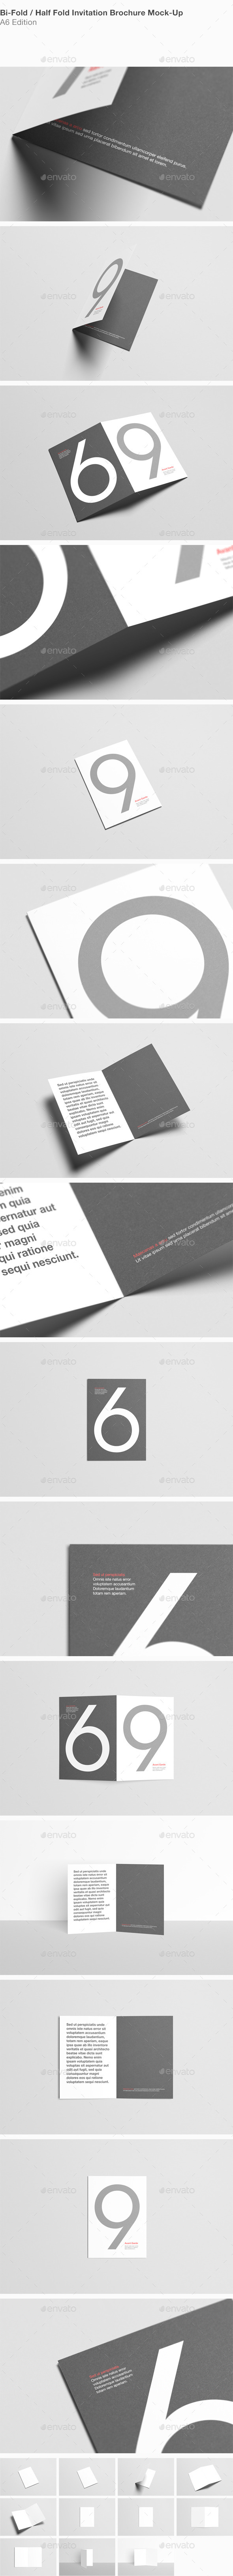 A6 Bi-Fold Half-Fold Invitation Brochure Mock-Up